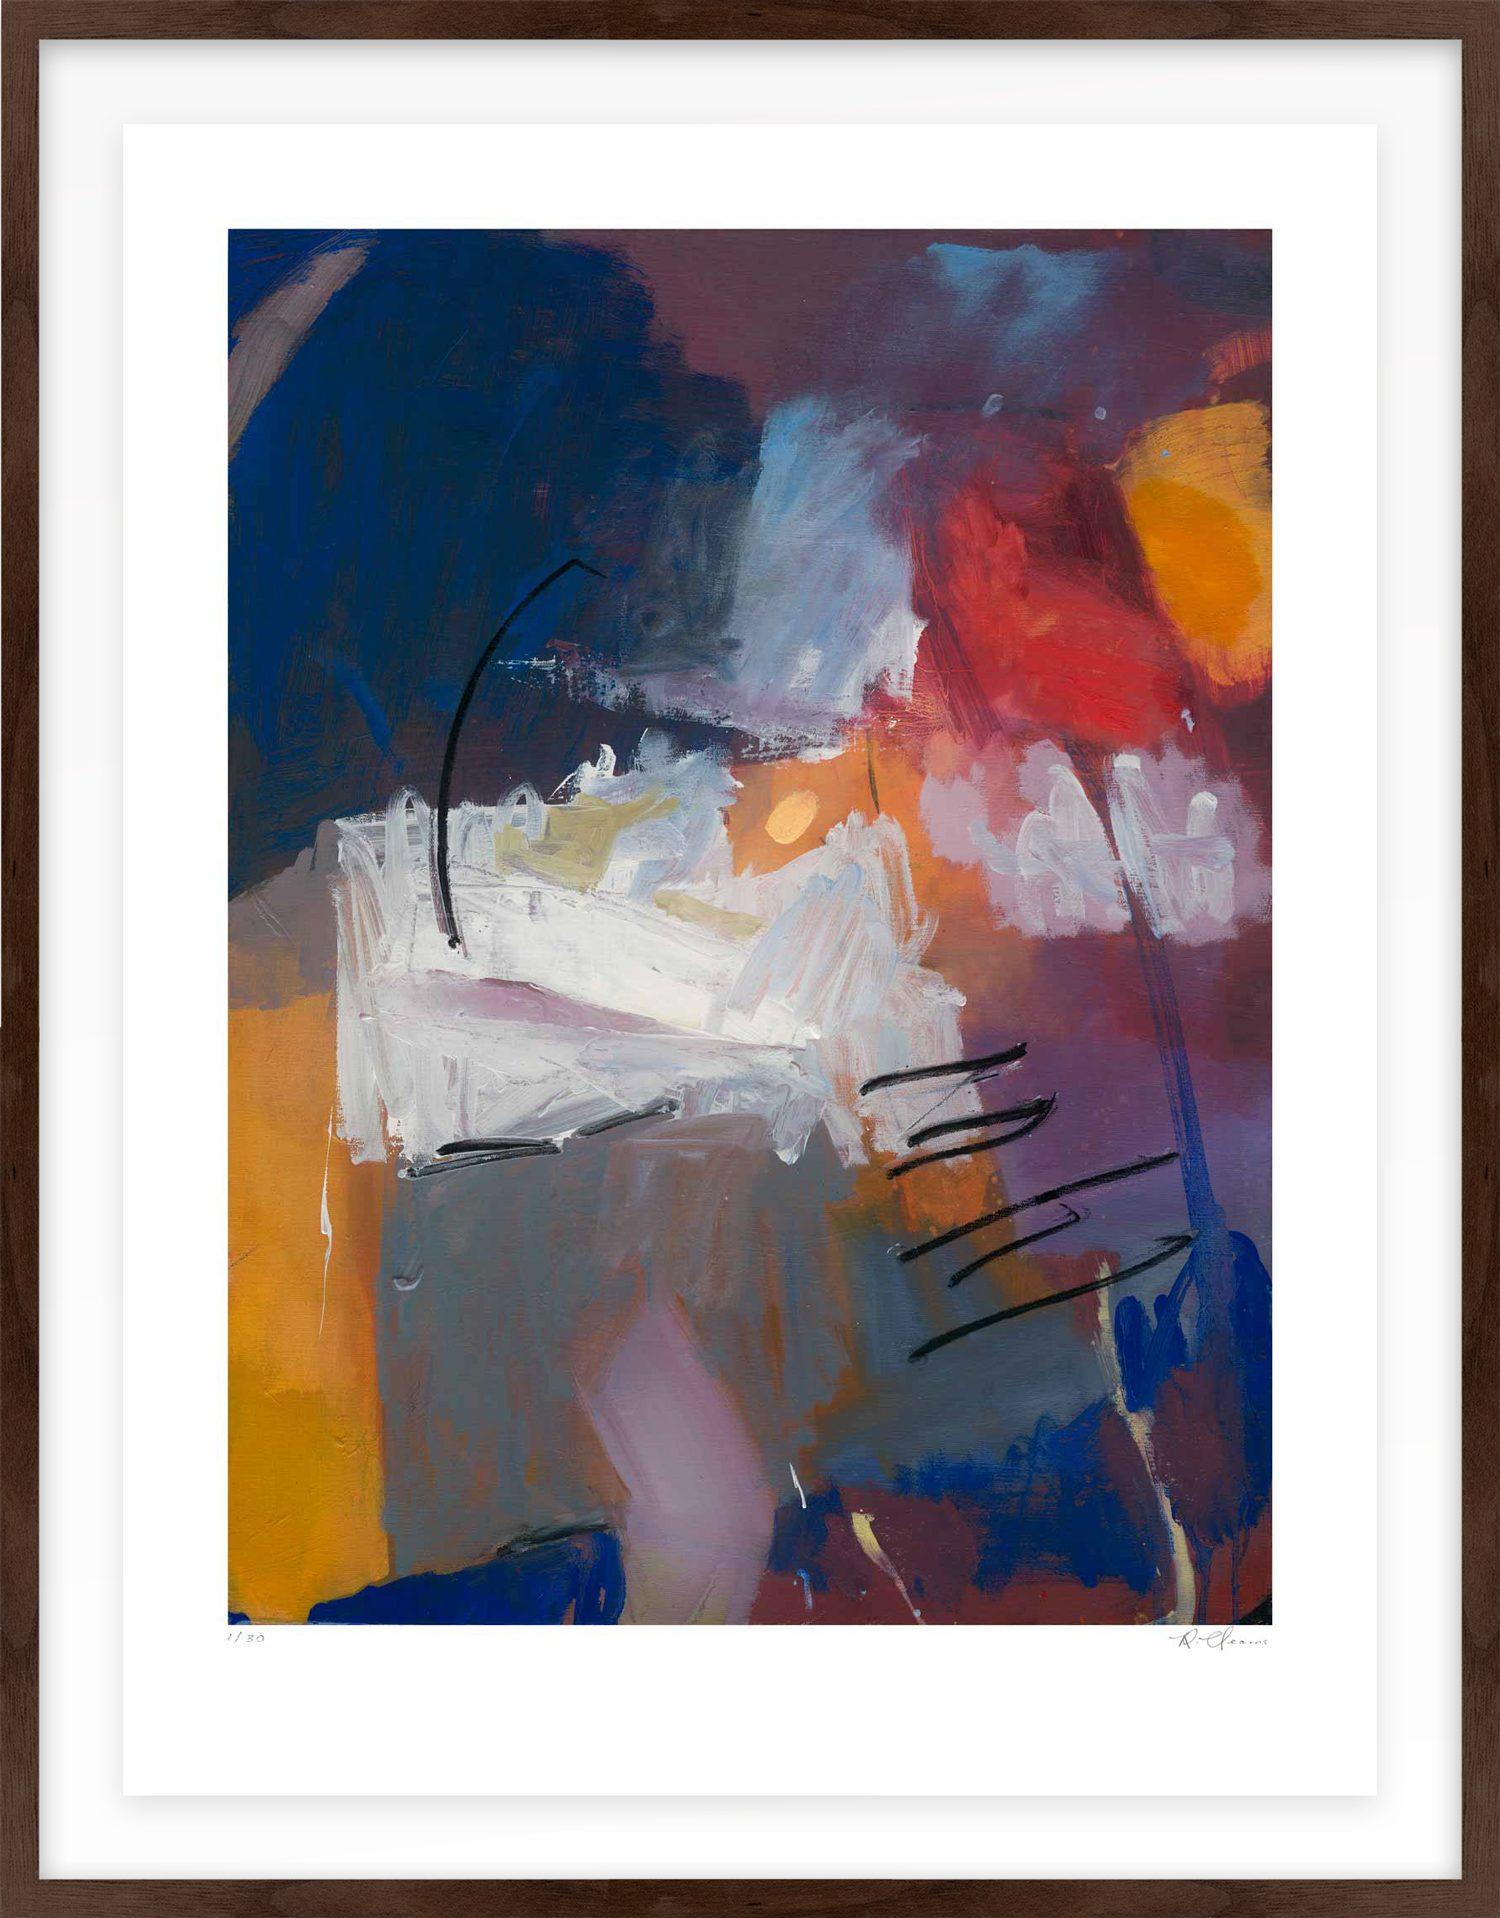 Hang Tough 'Churn' Float Framed in Walnut with Dye & Oil (Framing Only)